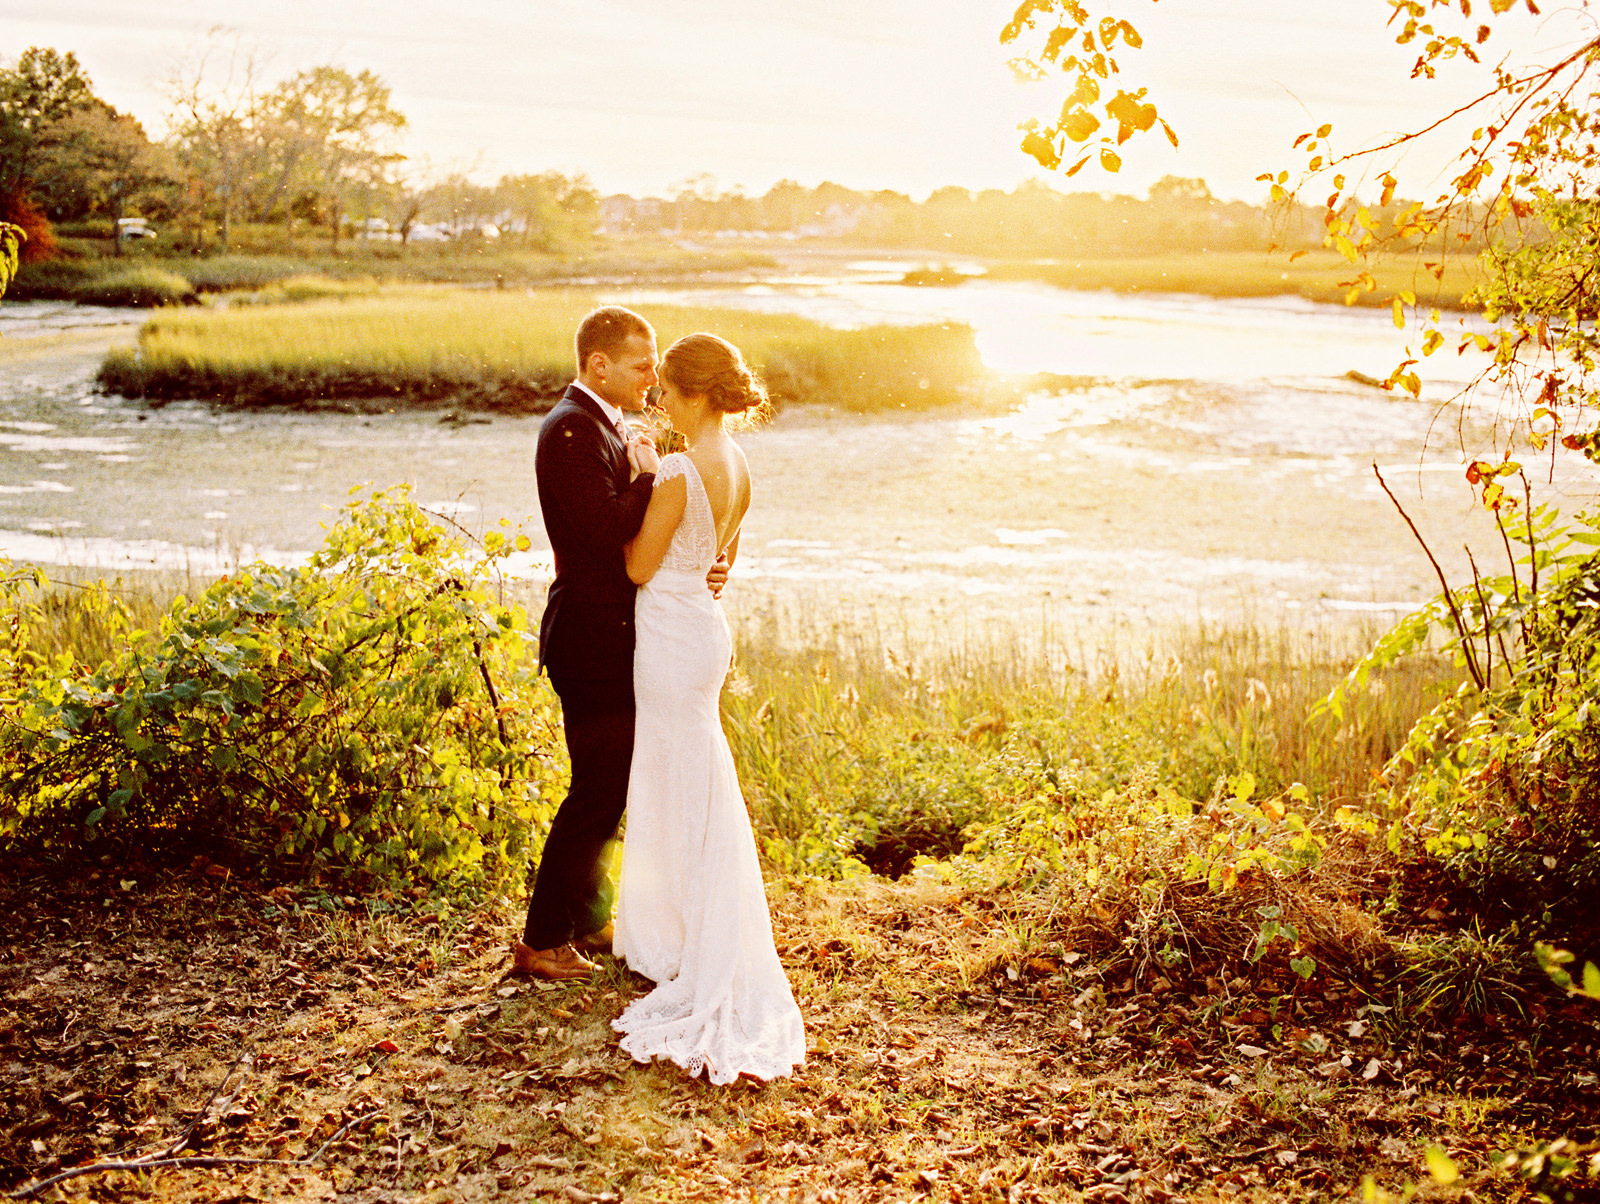 bridgeport-wedding-123 BRIDGEPORT, CONNECTICUT BACKYARD WEDDING